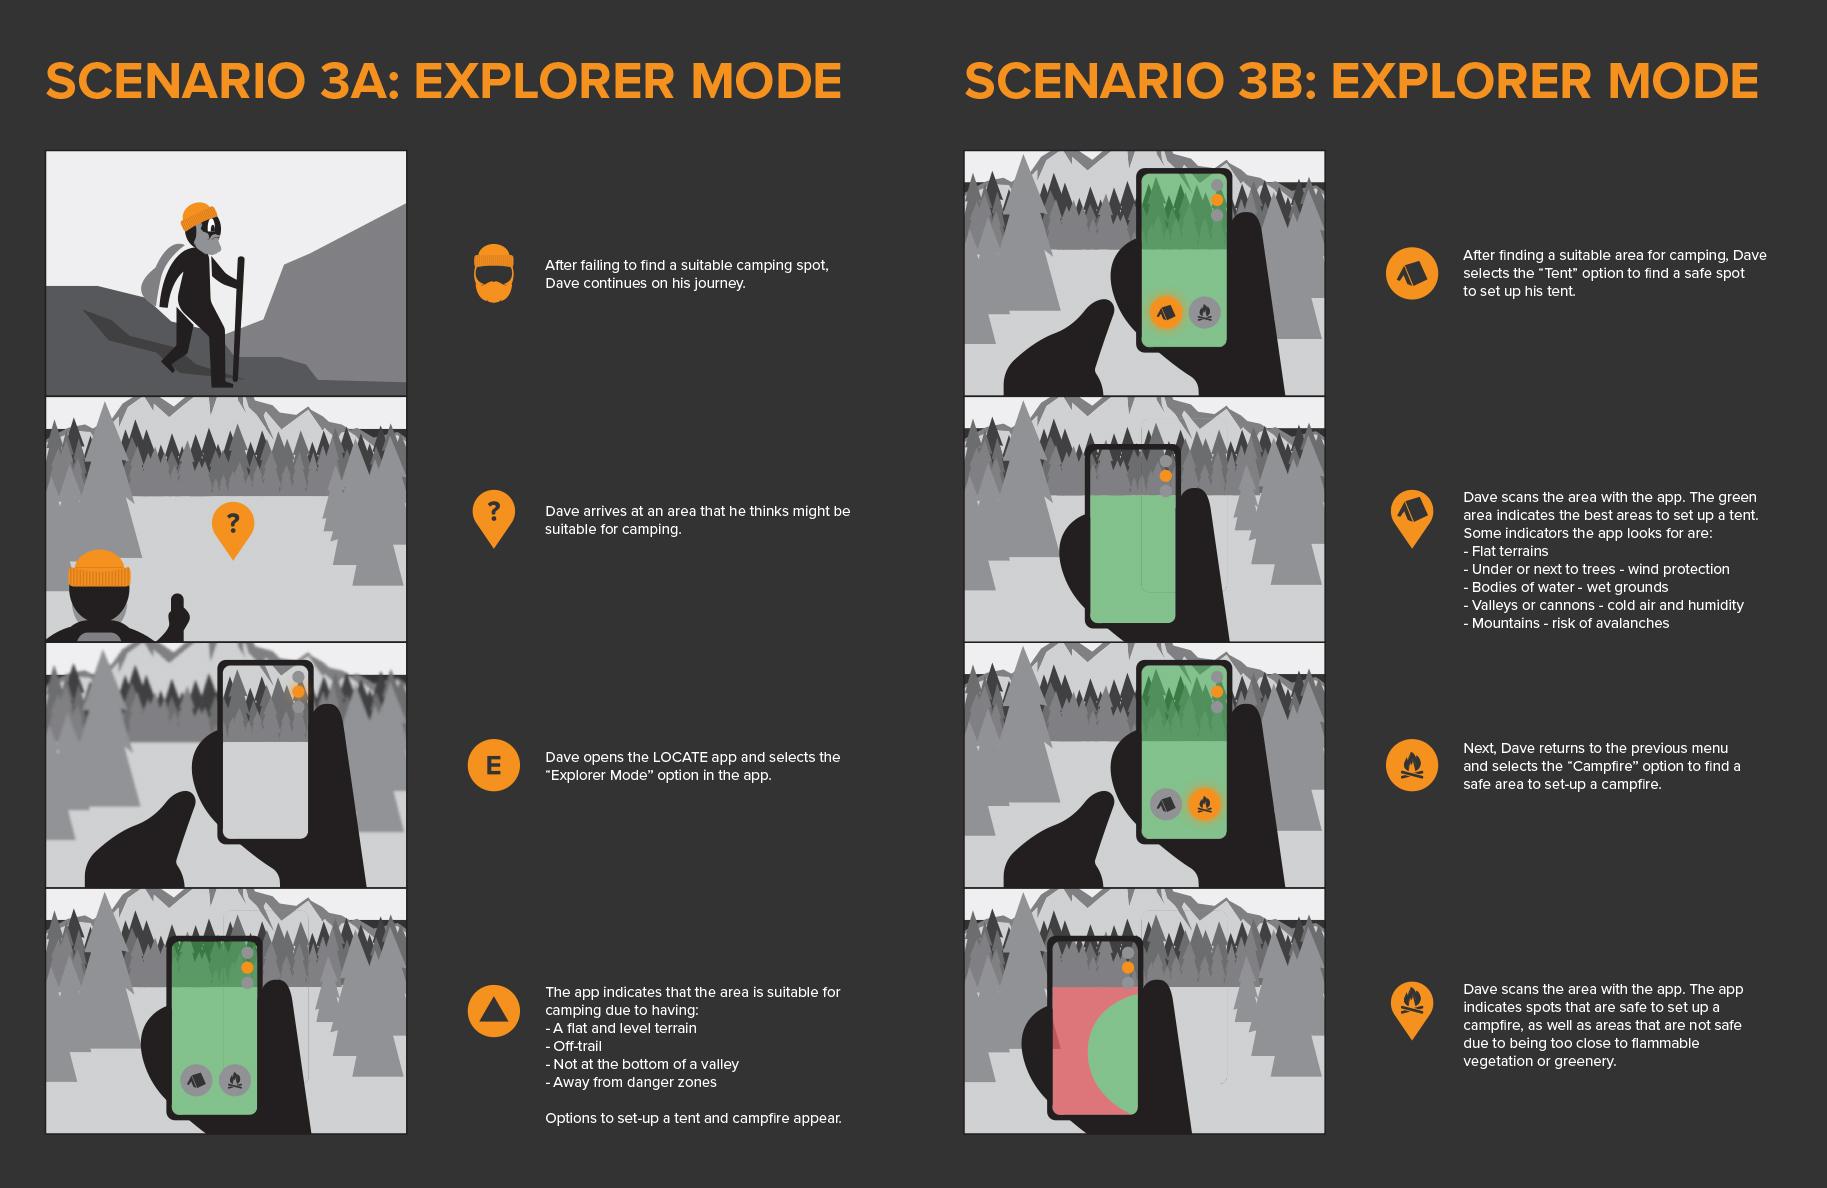 Scenario 3 Explorer mode setting up camp